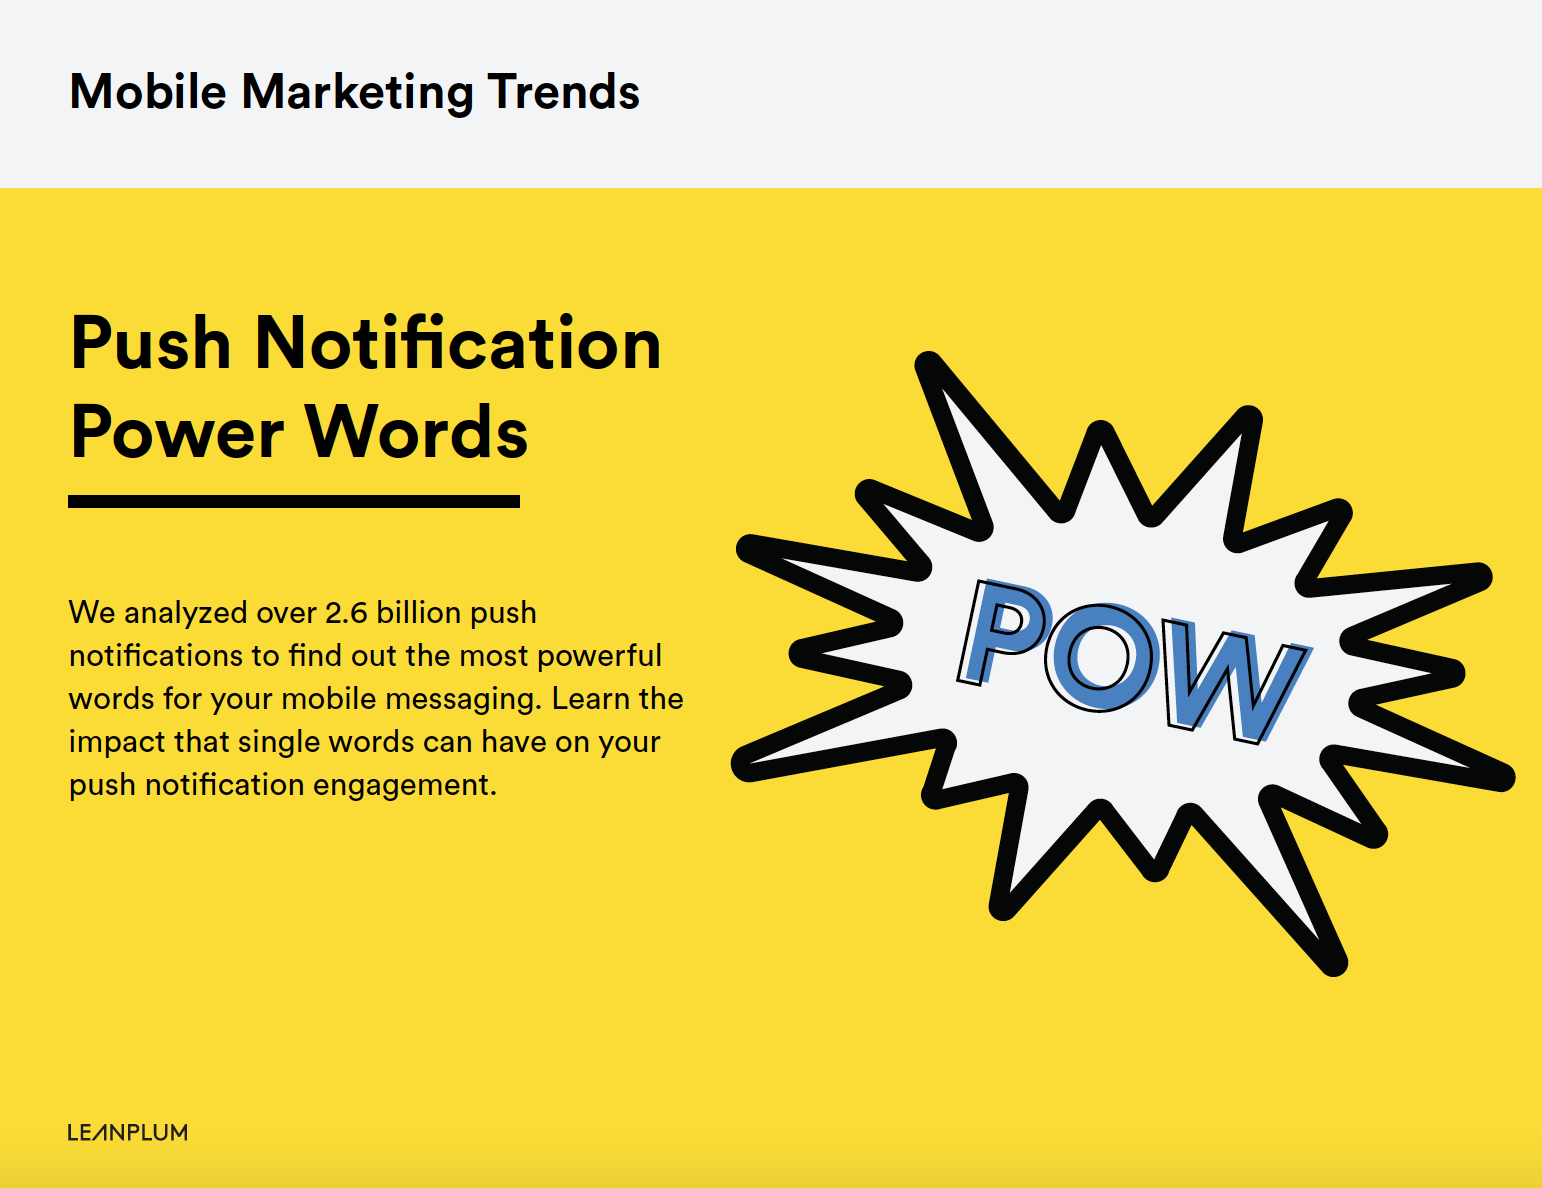 Push Notification Power Words